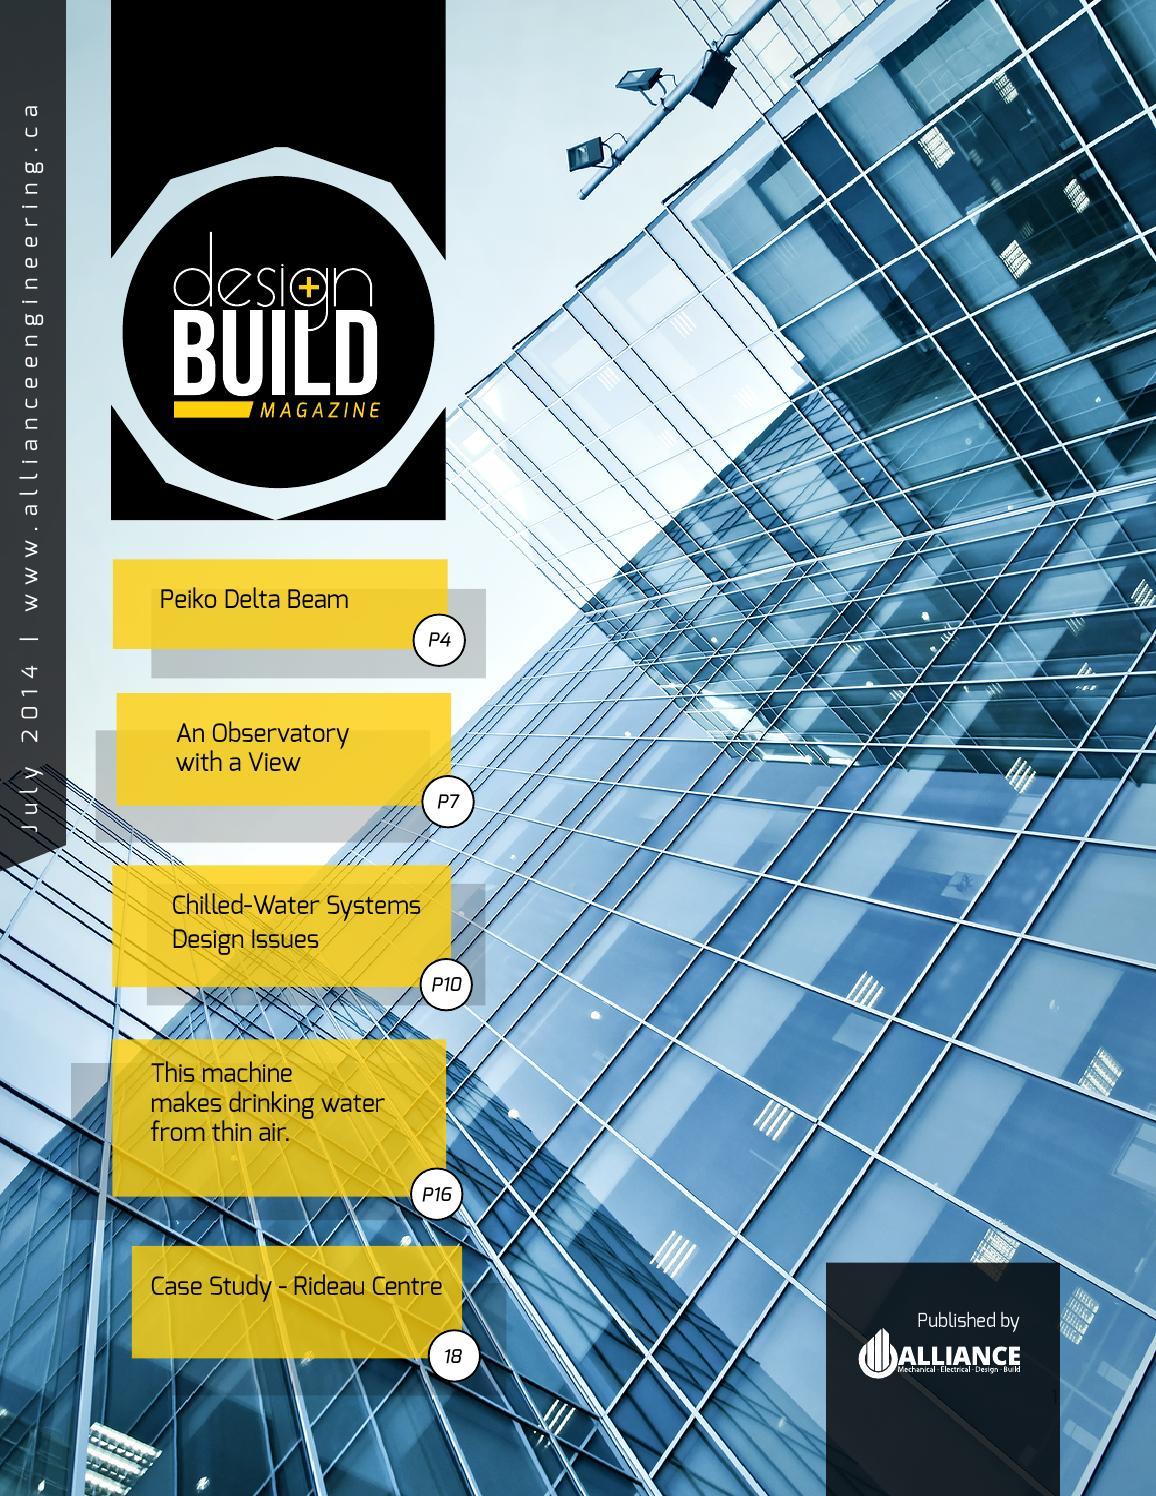 Design Build Magazine - July 2014 by Alliance Engineering - issuu